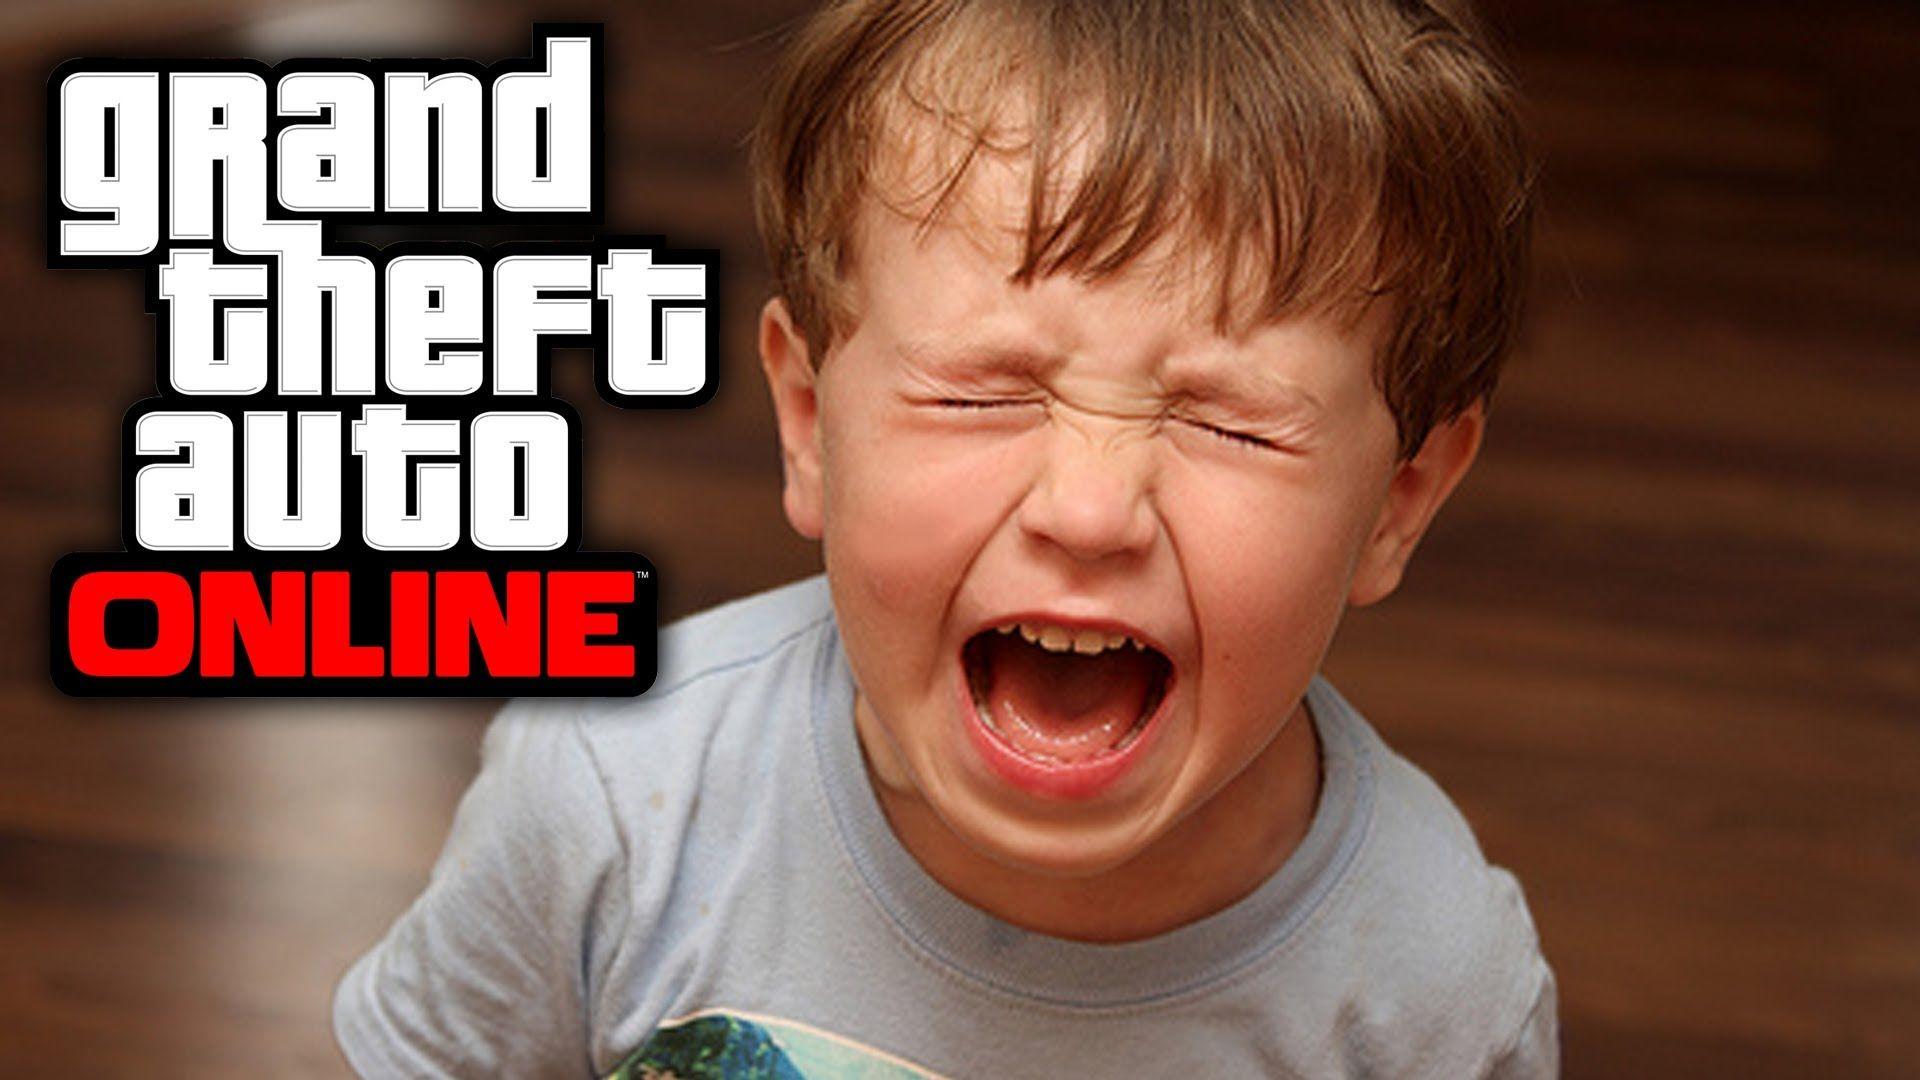 Kid Raging Hardcore In Gta Online After Being Trolled By